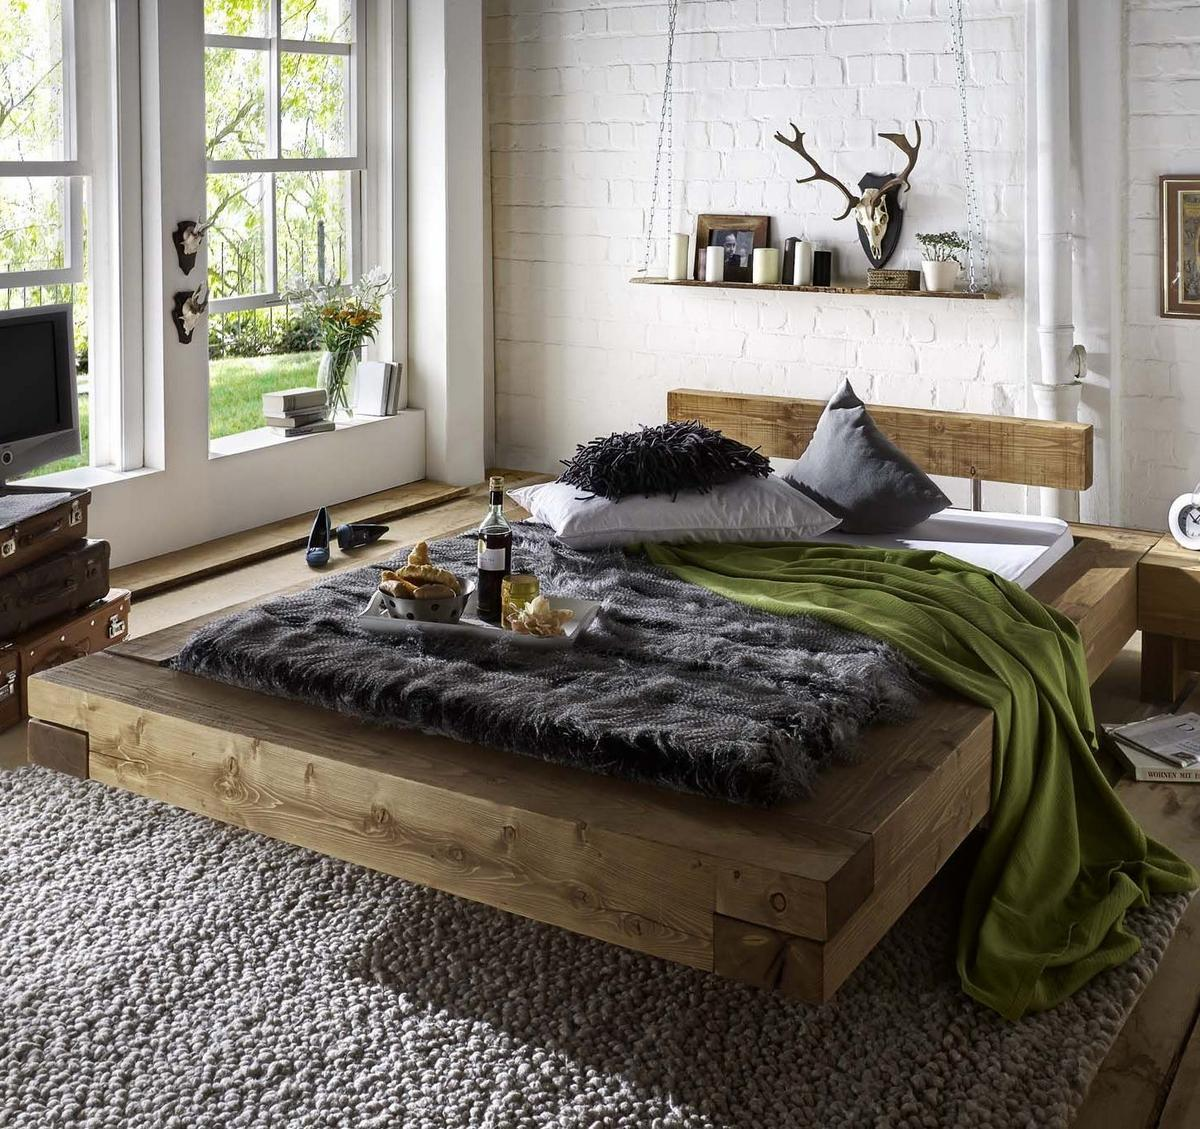 schwebebett selber bauen sofa selber bauen selbstgebaute m bel garten sofa selber bauen. Black Bedroom Furniture Sets. Home Design Ideas